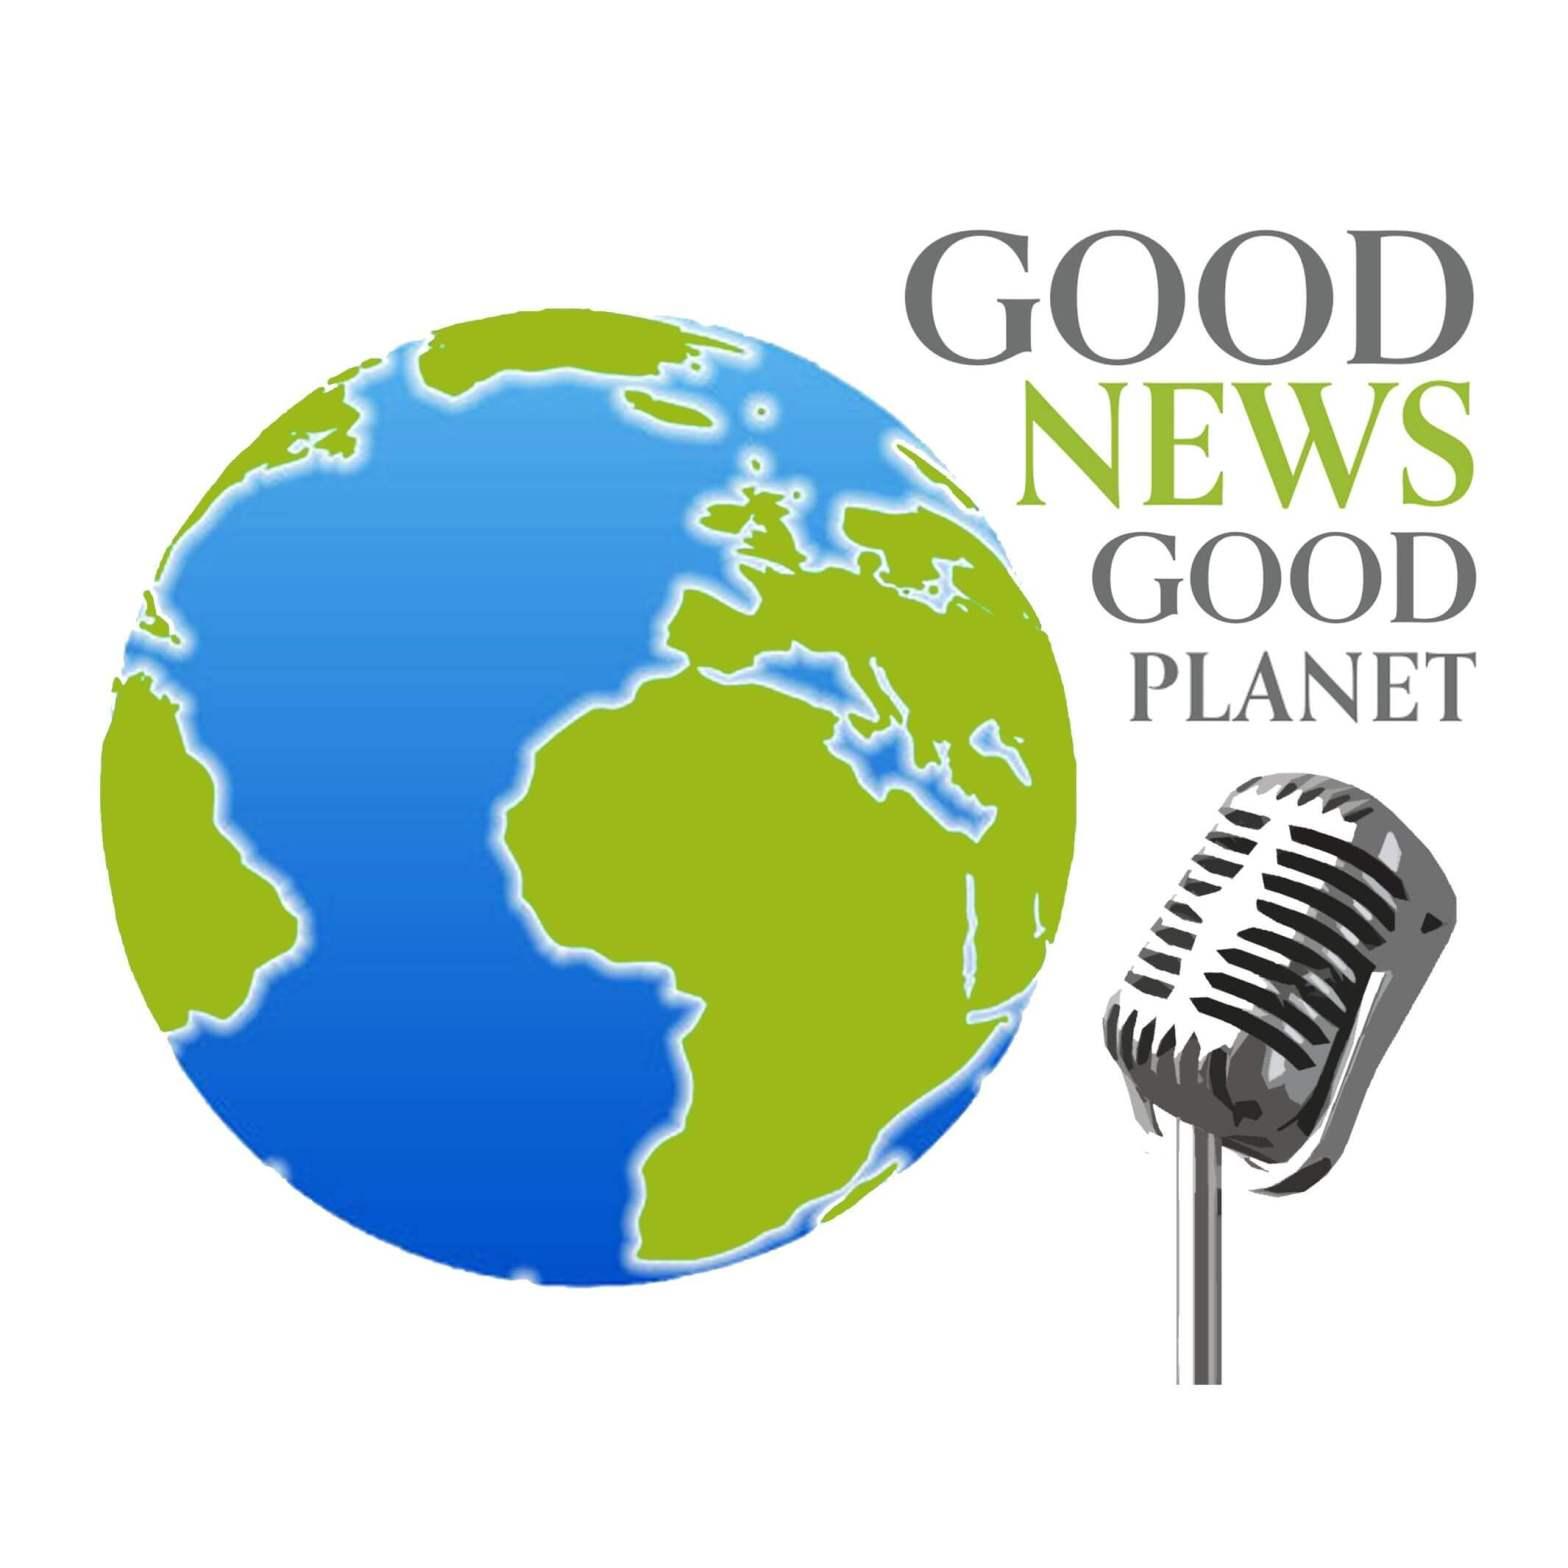 Good News Planet